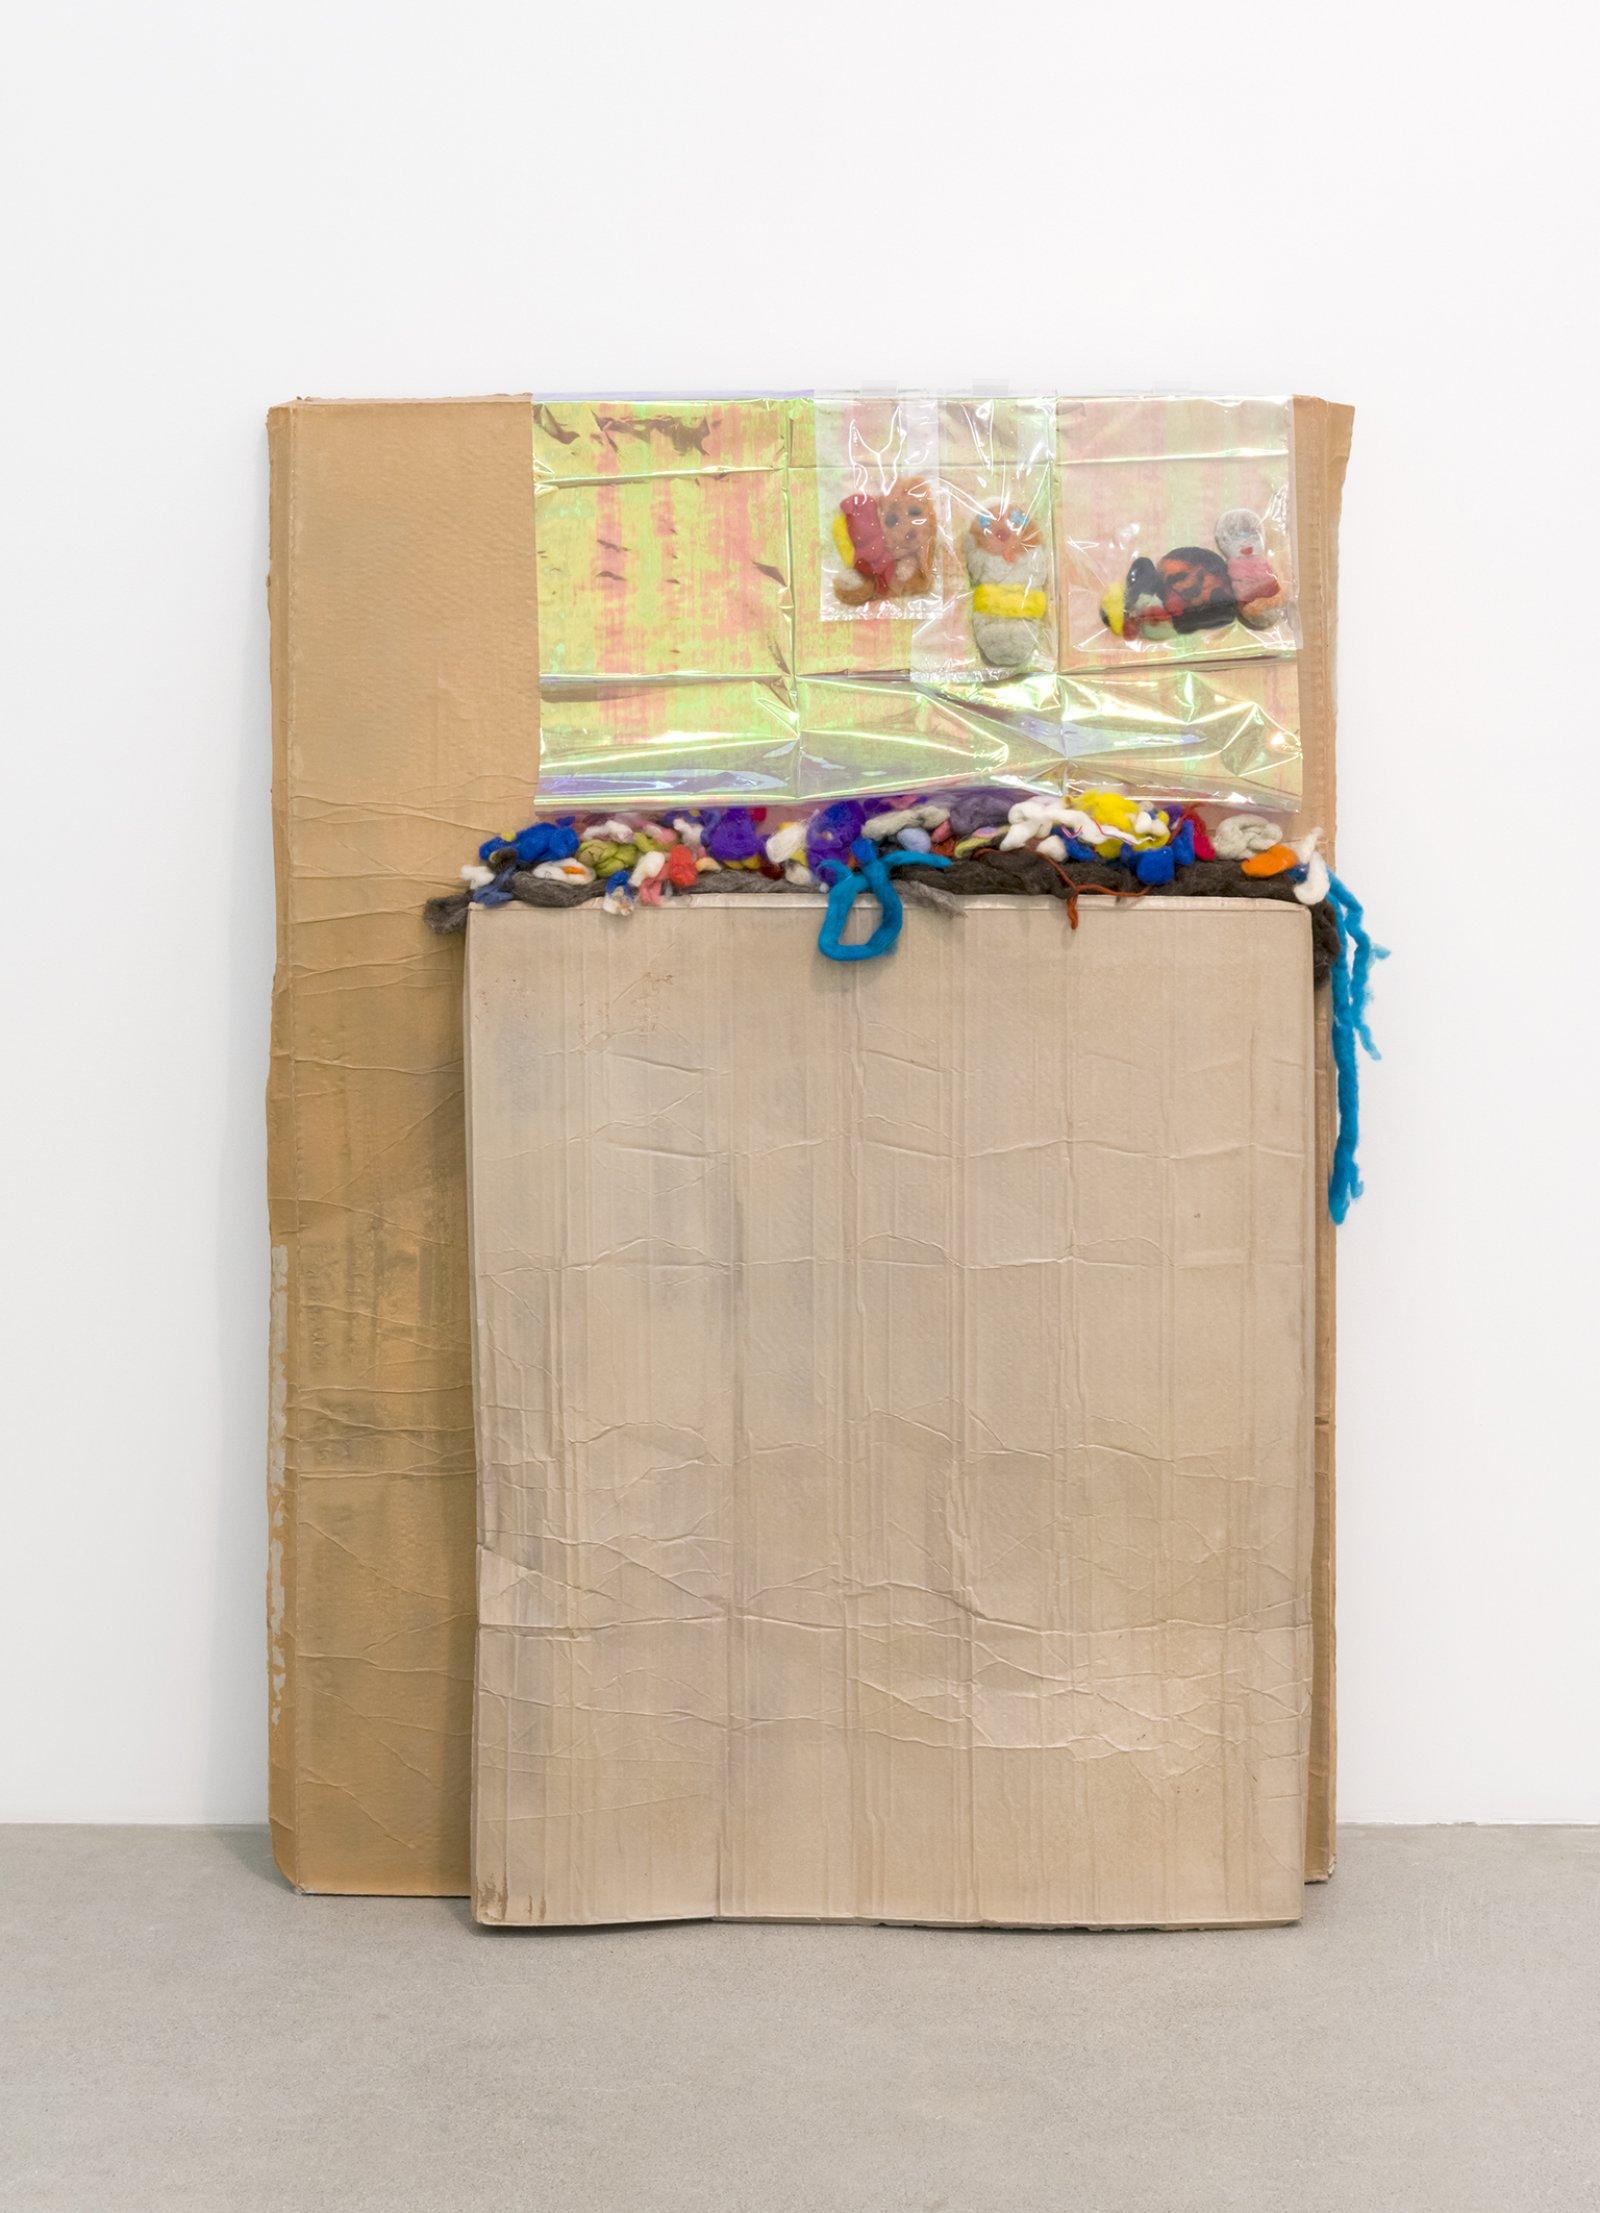 Liz Magor, Felt People, 2016, polymerized gypsum, wool, plastic bags, plastic sheet, 61 x 43 x 14 in. (155 x 109 x 34 cm) by Liz Magor